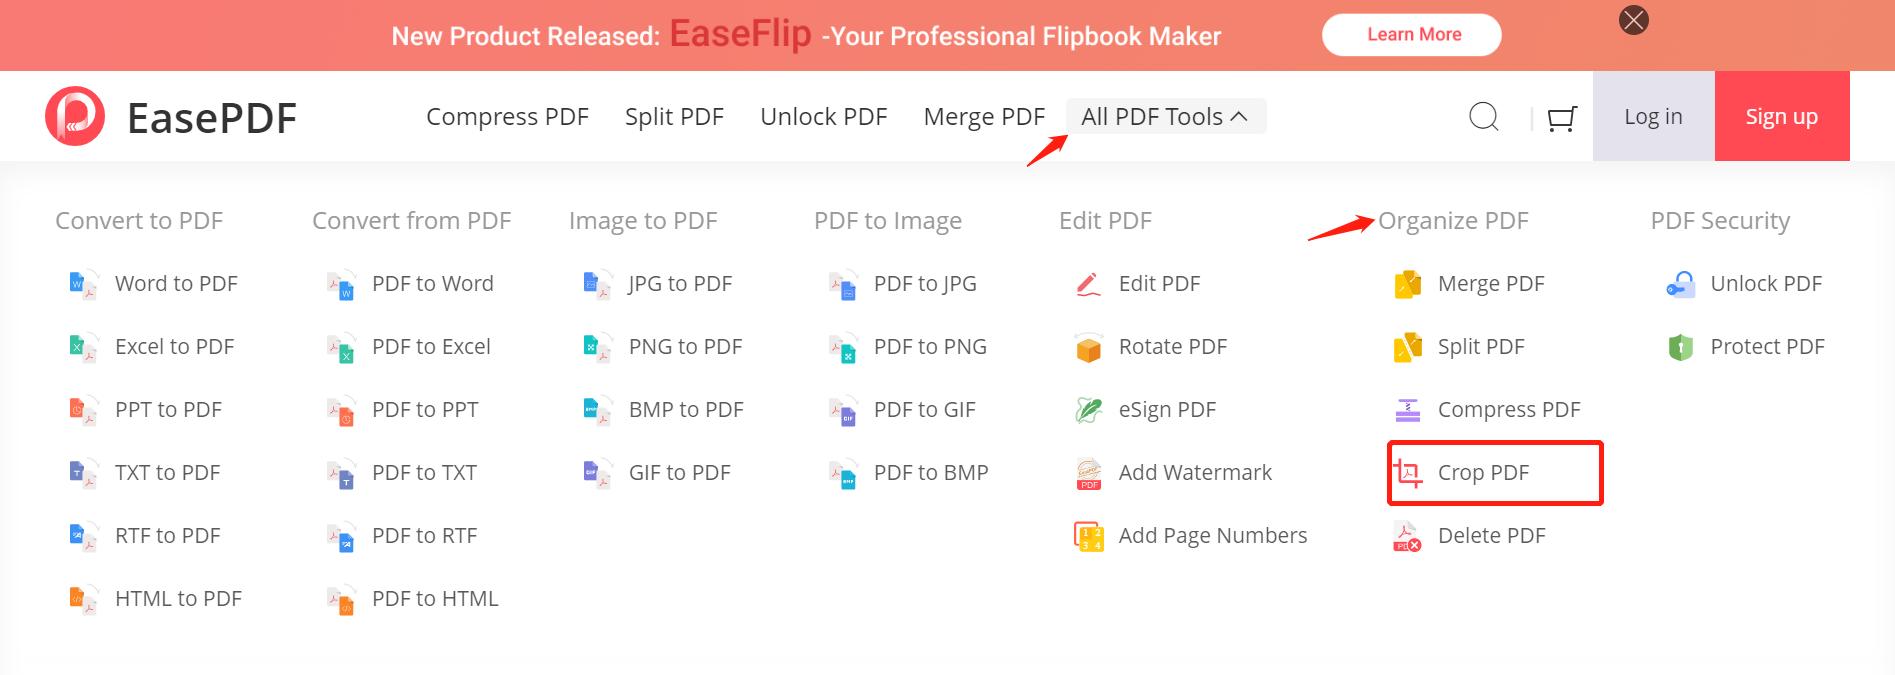 easepdf-cropper